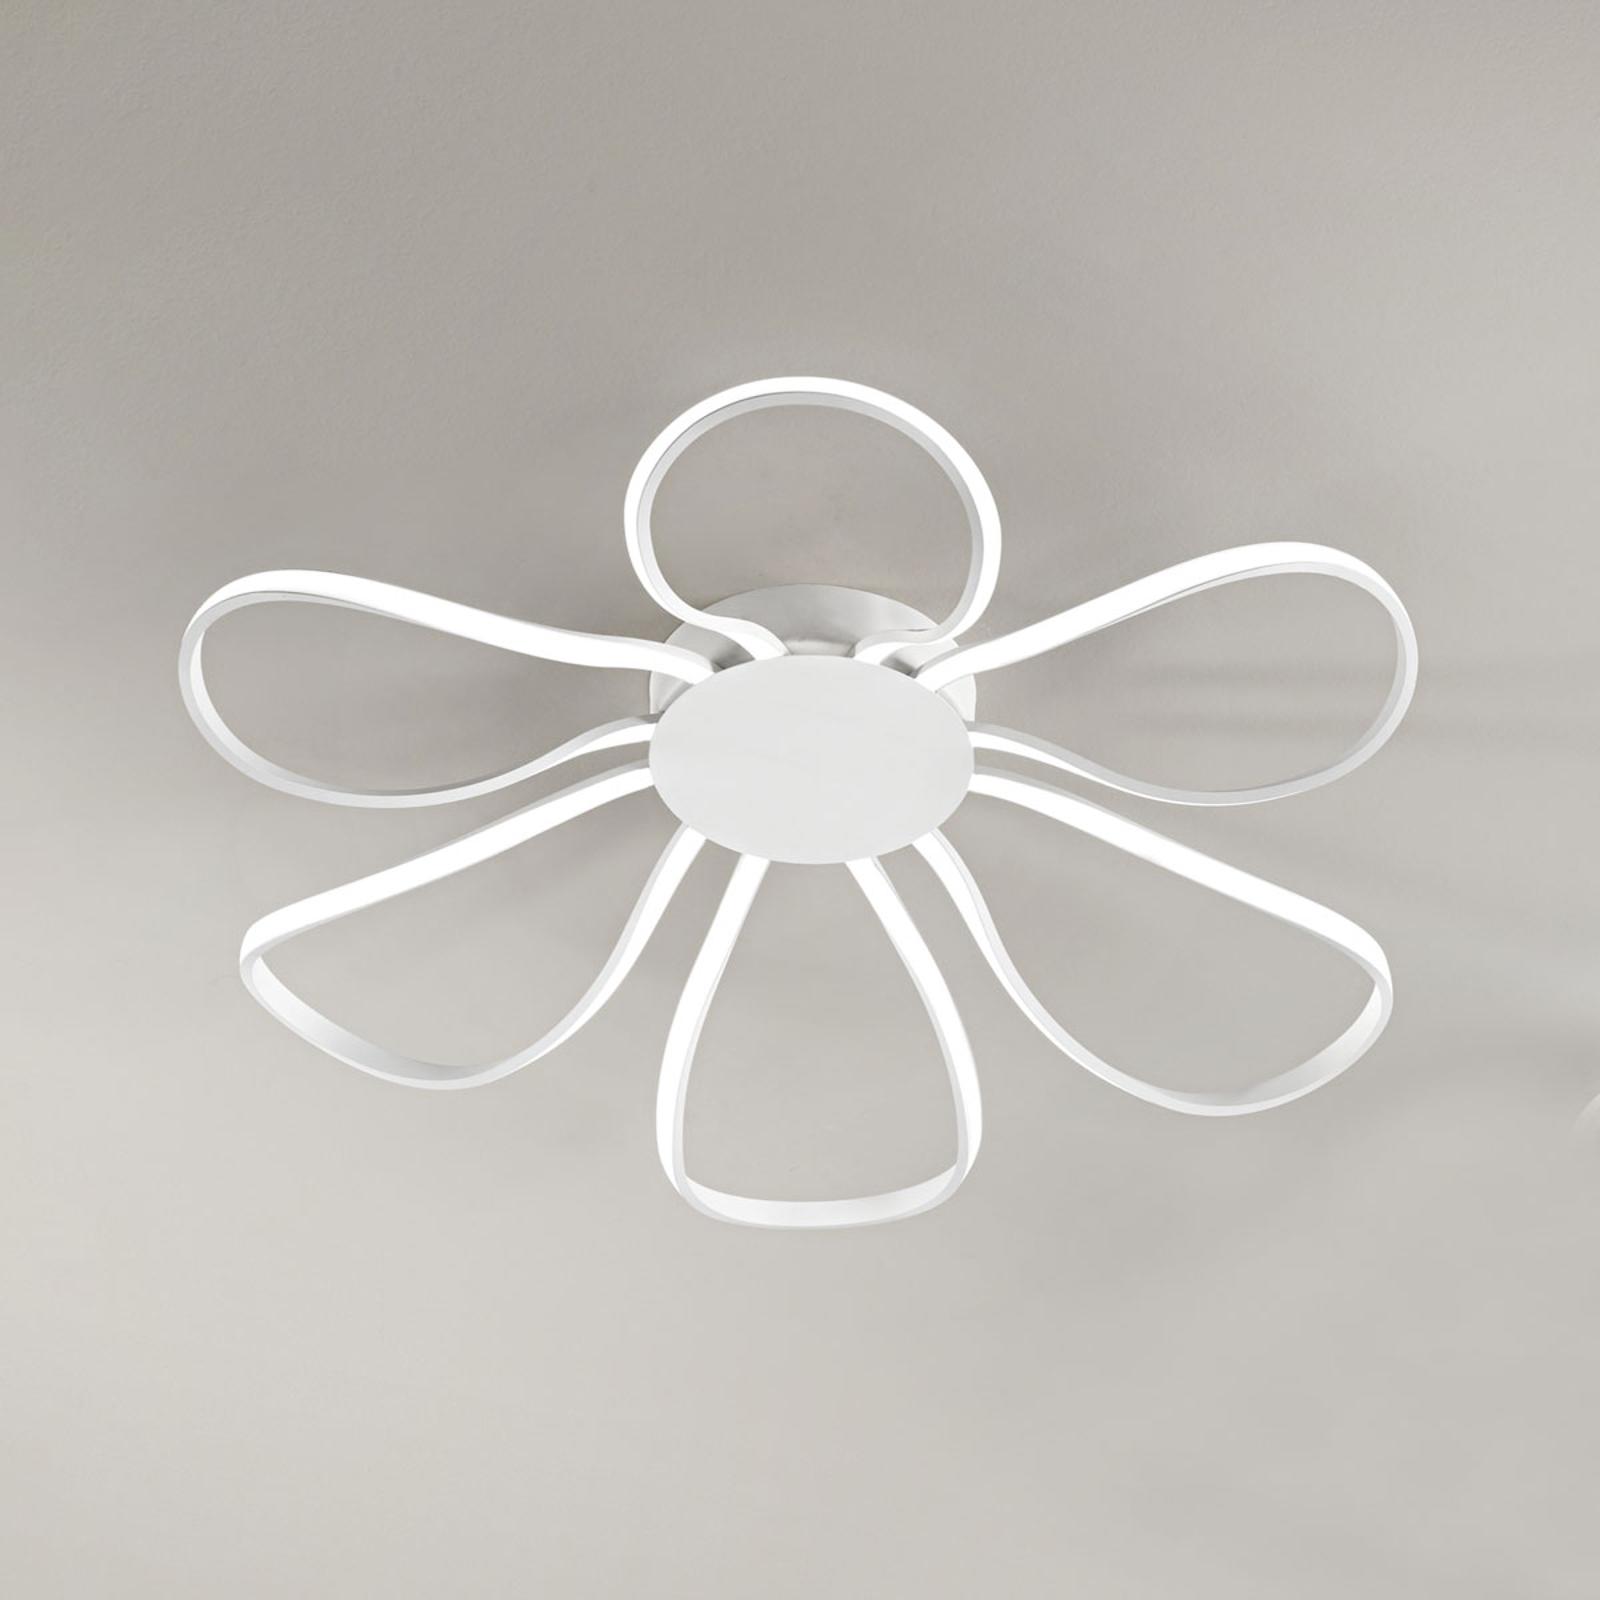 Lampa sufitowa LED Blossom, Ø 81 cm